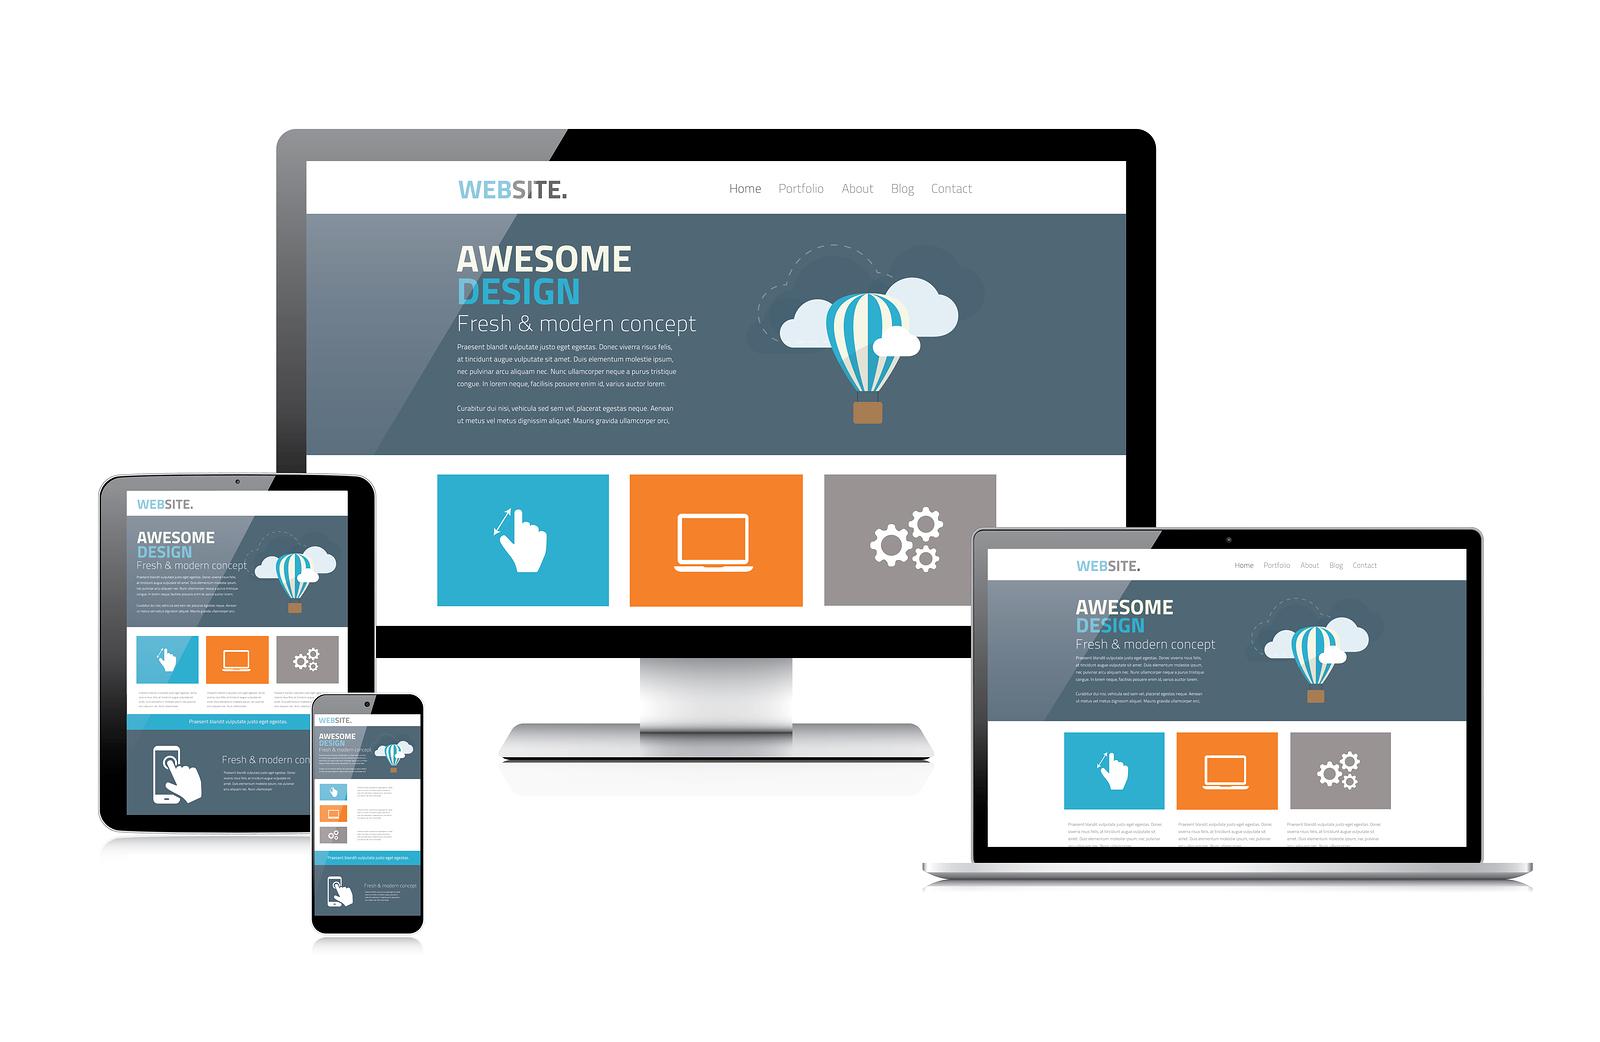 bigstock-Modern-flat-responsive-web-des-67523425